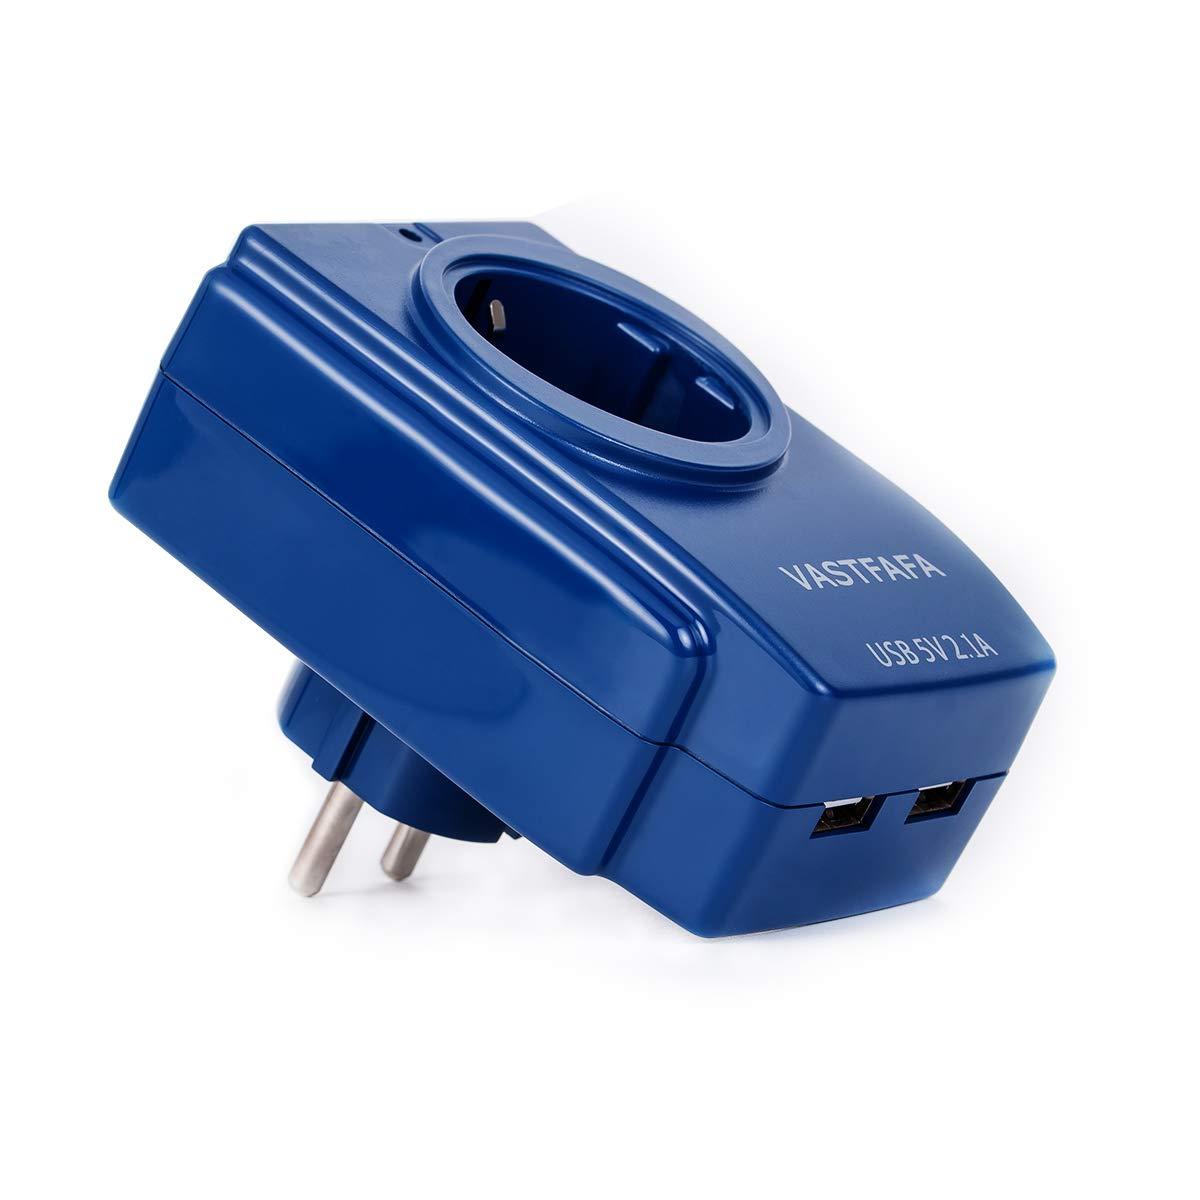 EU Plug Universal Power Travel Adapter of USB Charger